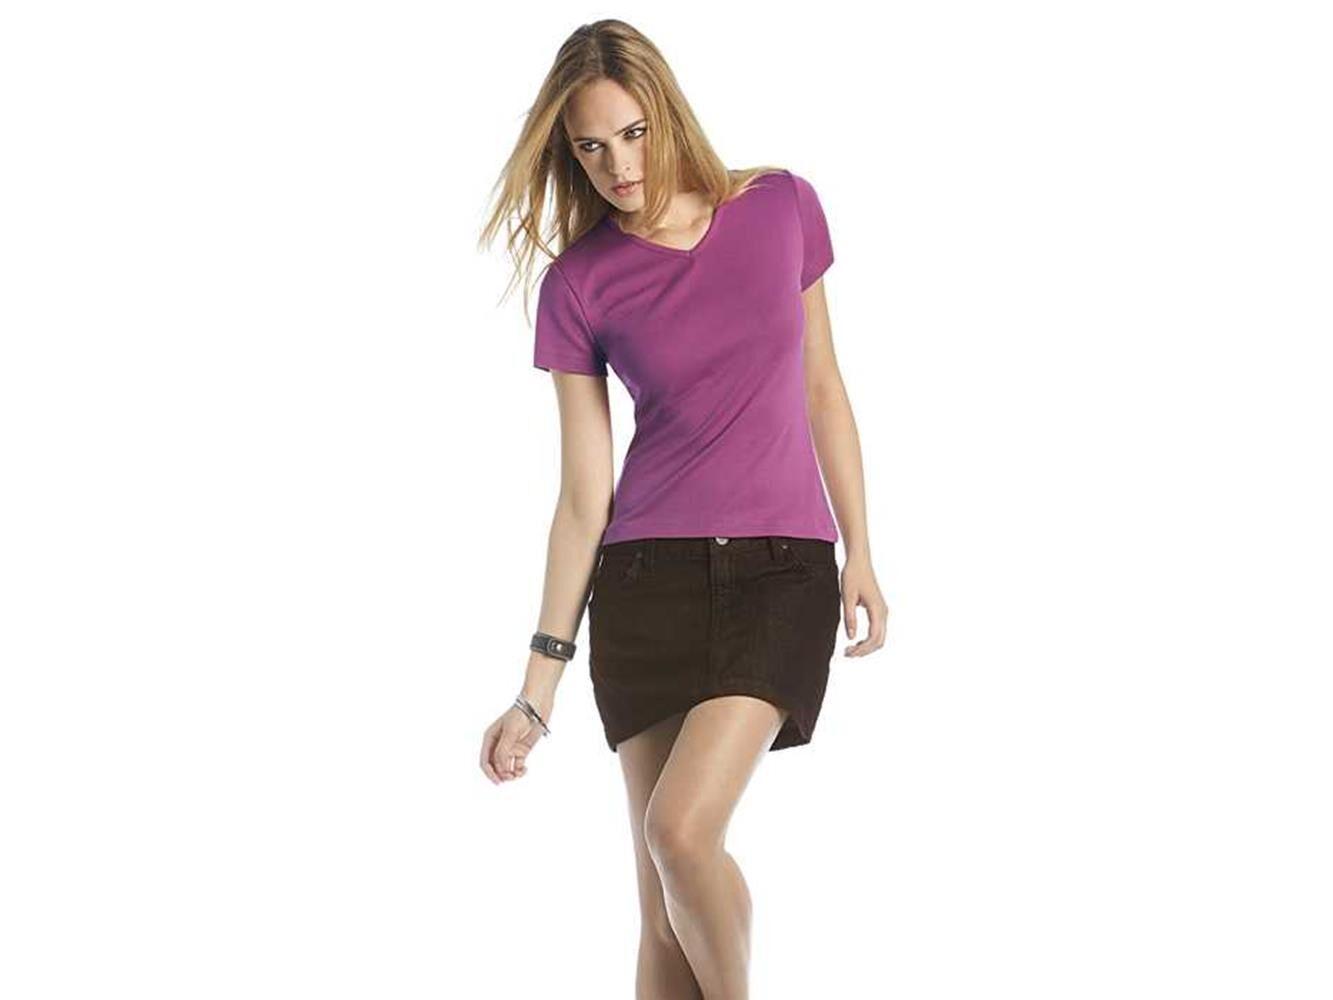 bec collection t-shirt donna elasticizzata scollo a v watch b&c collection